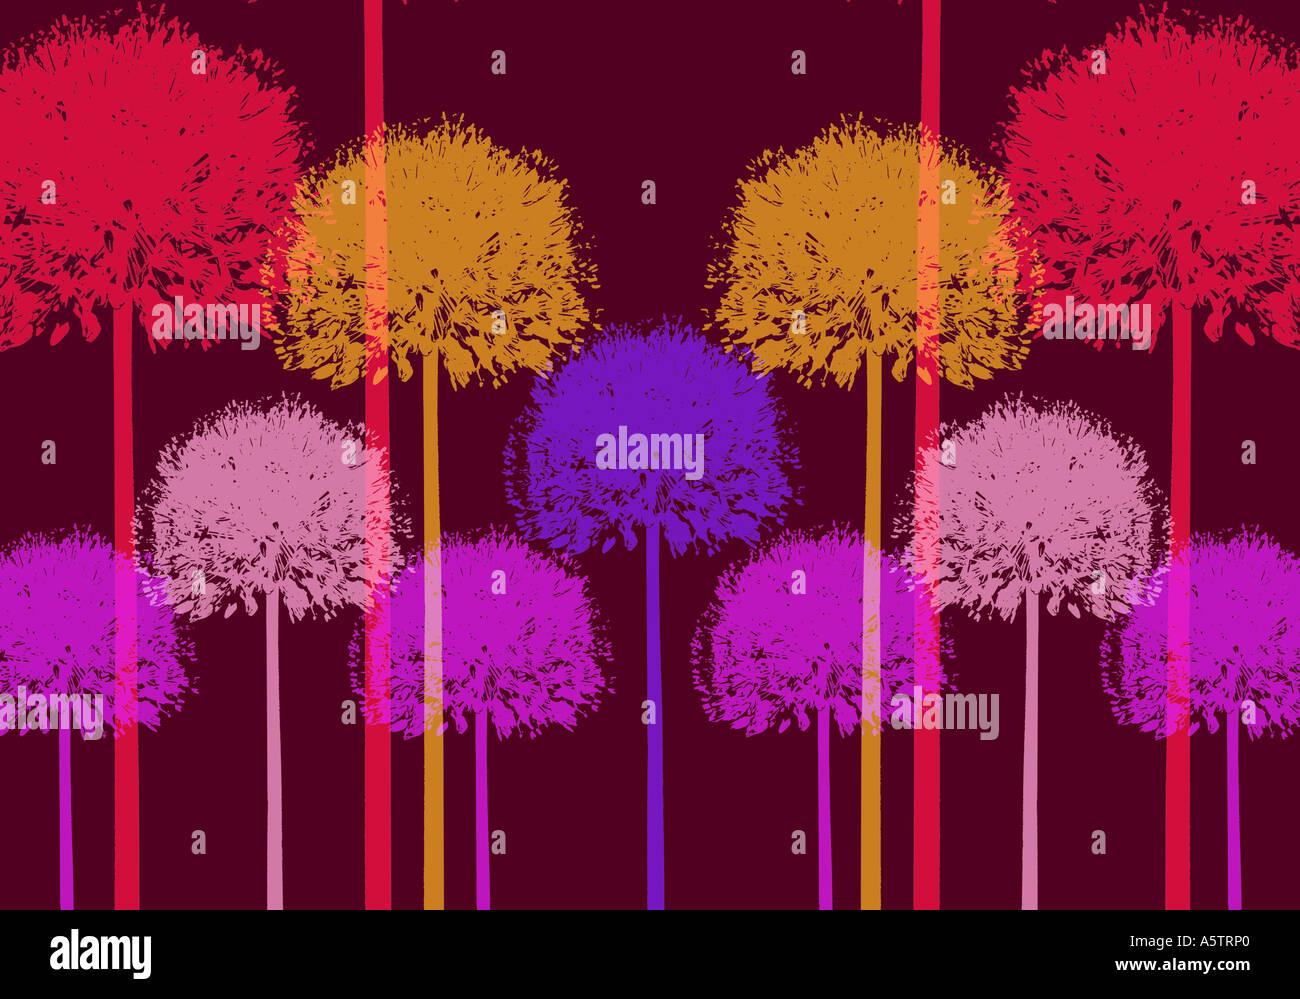 Graphic pattern - Allium illustration Stock Photo